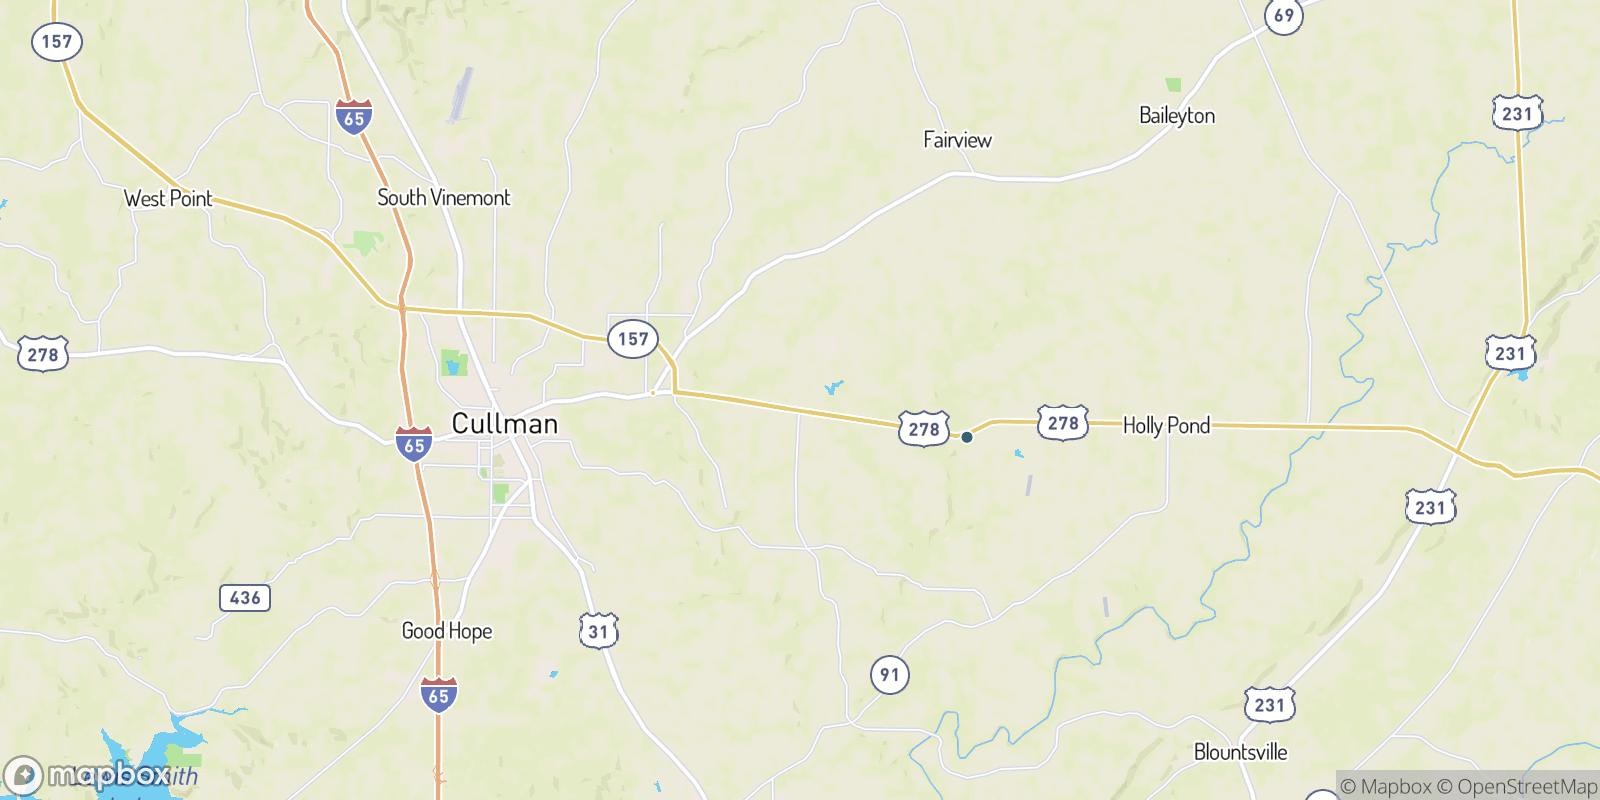 The best camping near Berlin, Alabama